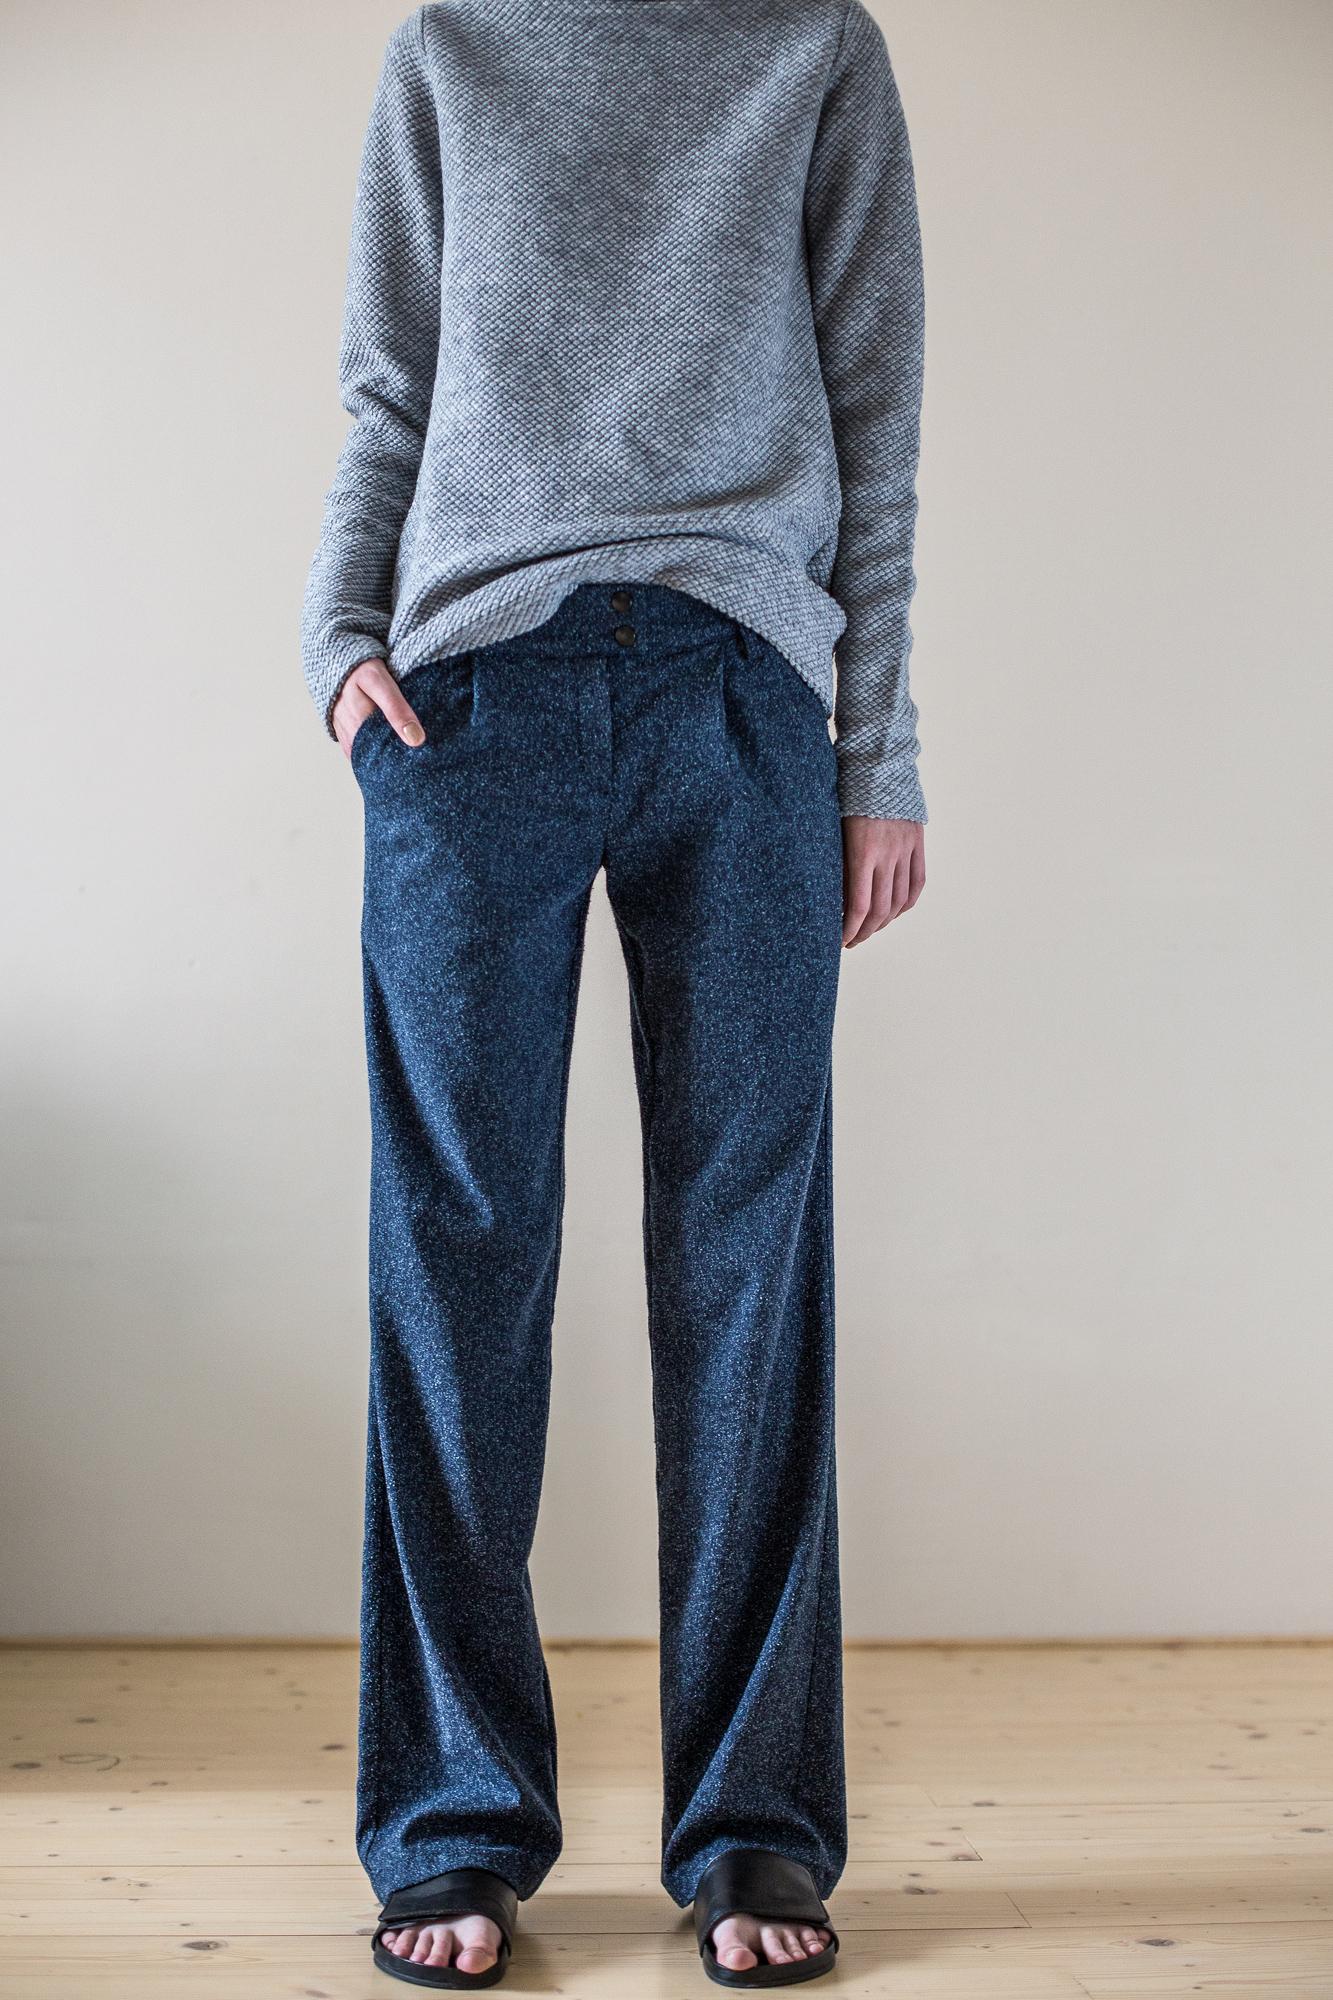 wearenotsisters_wrns_sculpture-pants_02